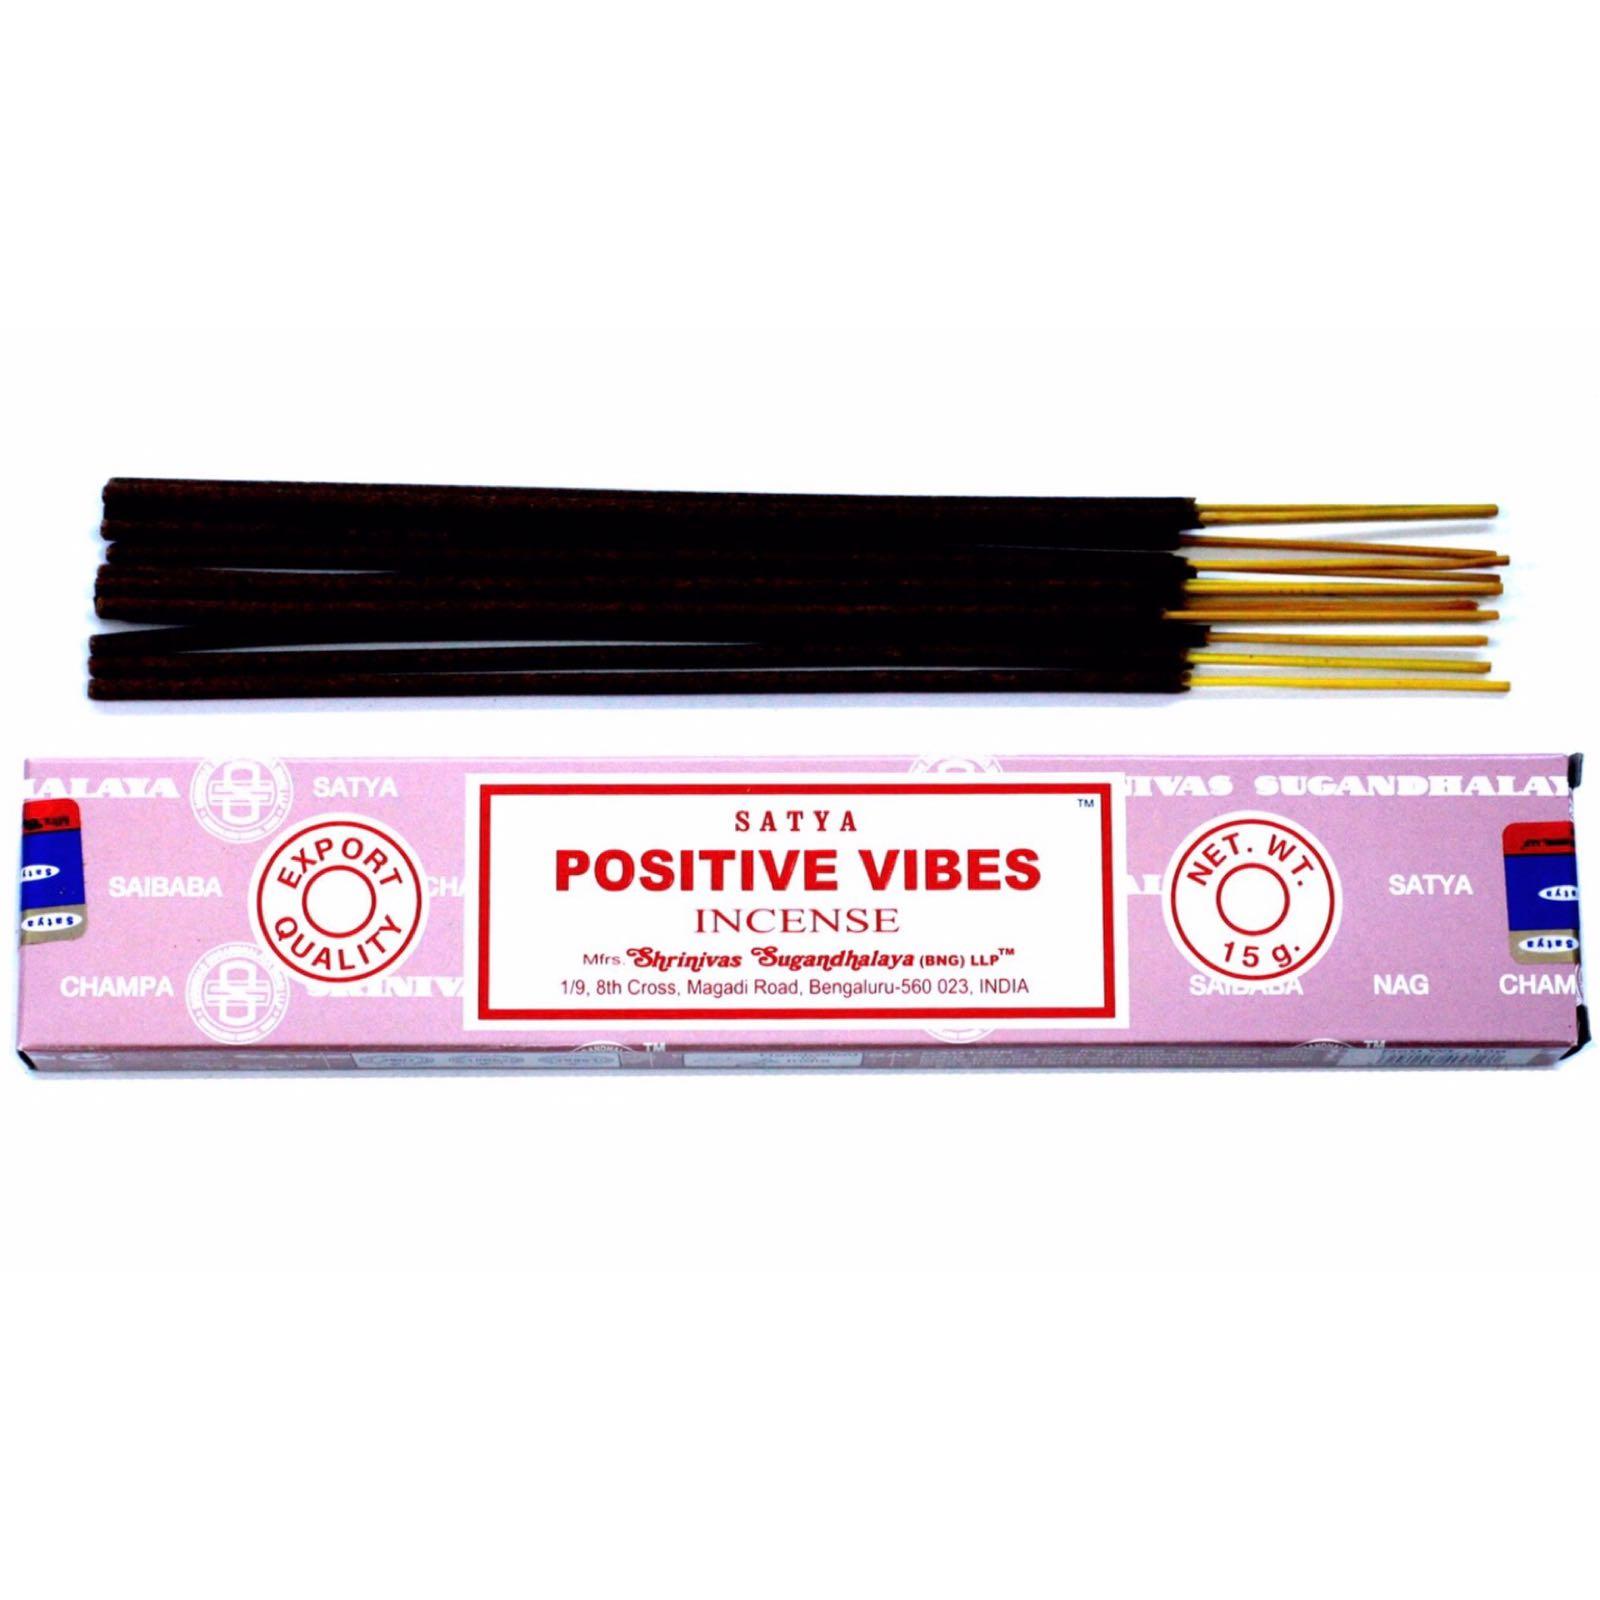 'Positive Vibes' Incense Sticks